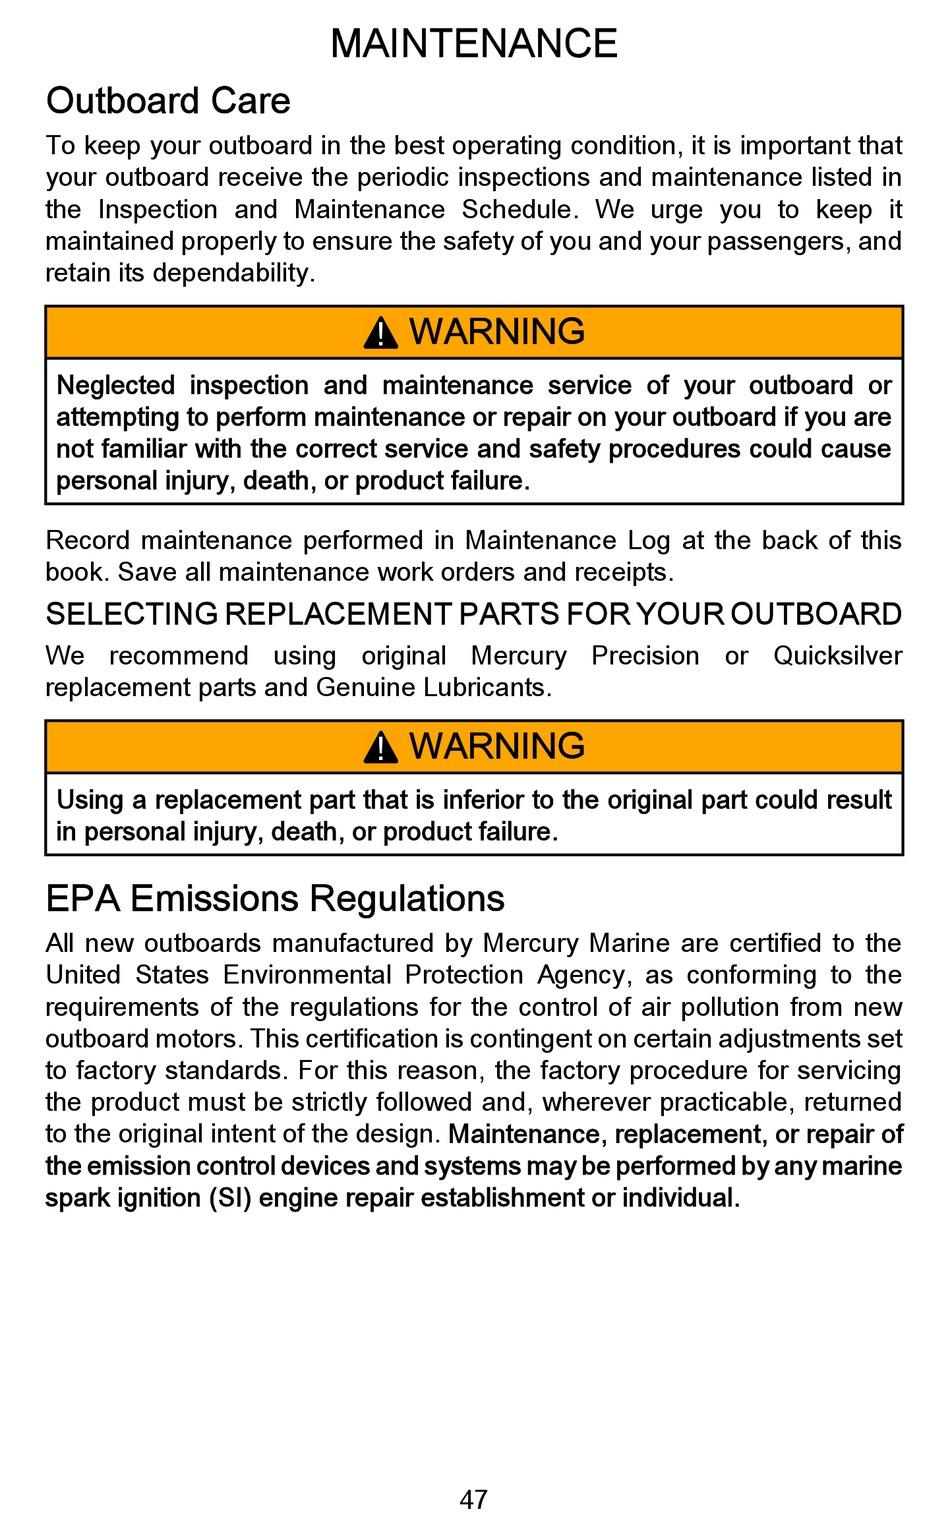 MERCURY OUTBOARD MOTOR USER MANUAL Pdf Download | ManualsLib